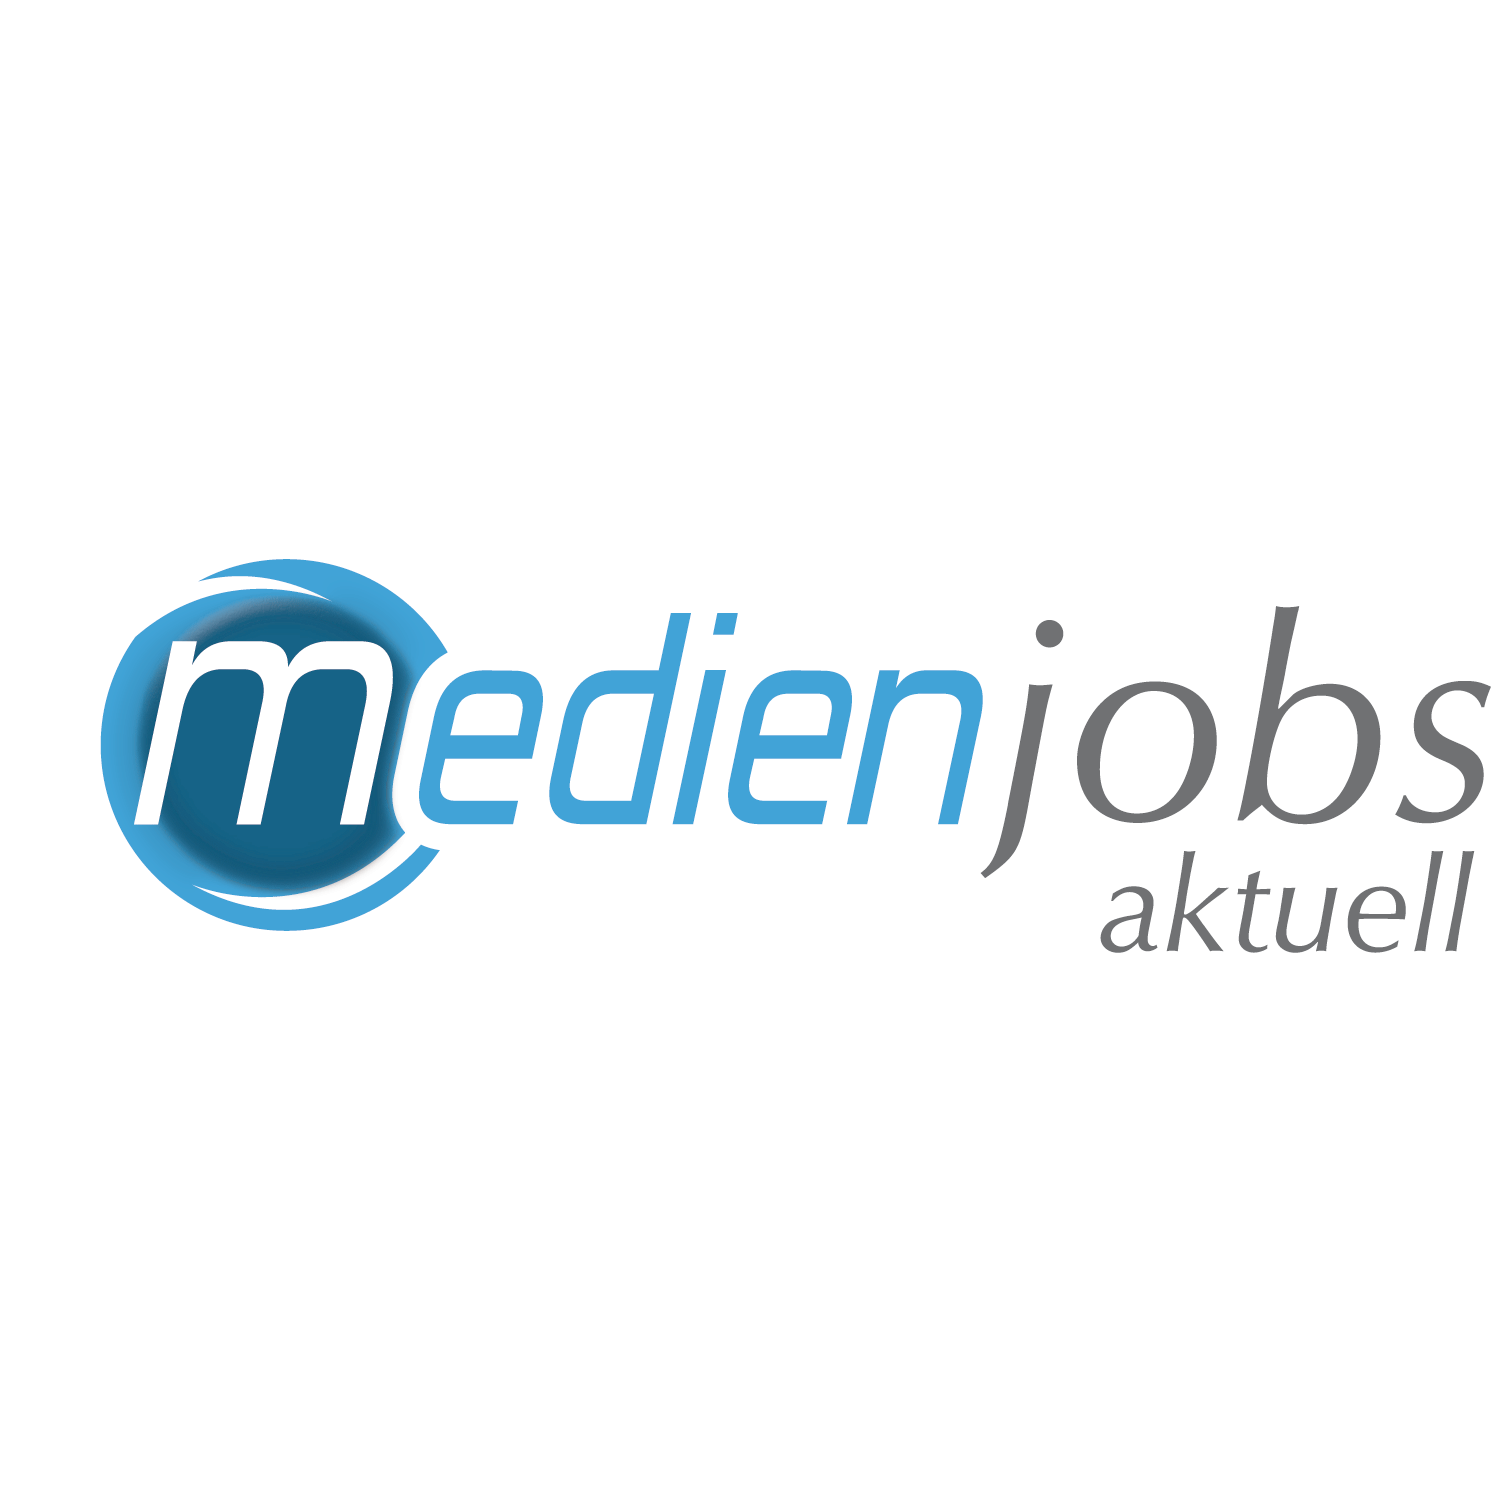 medienjobs-aktuell